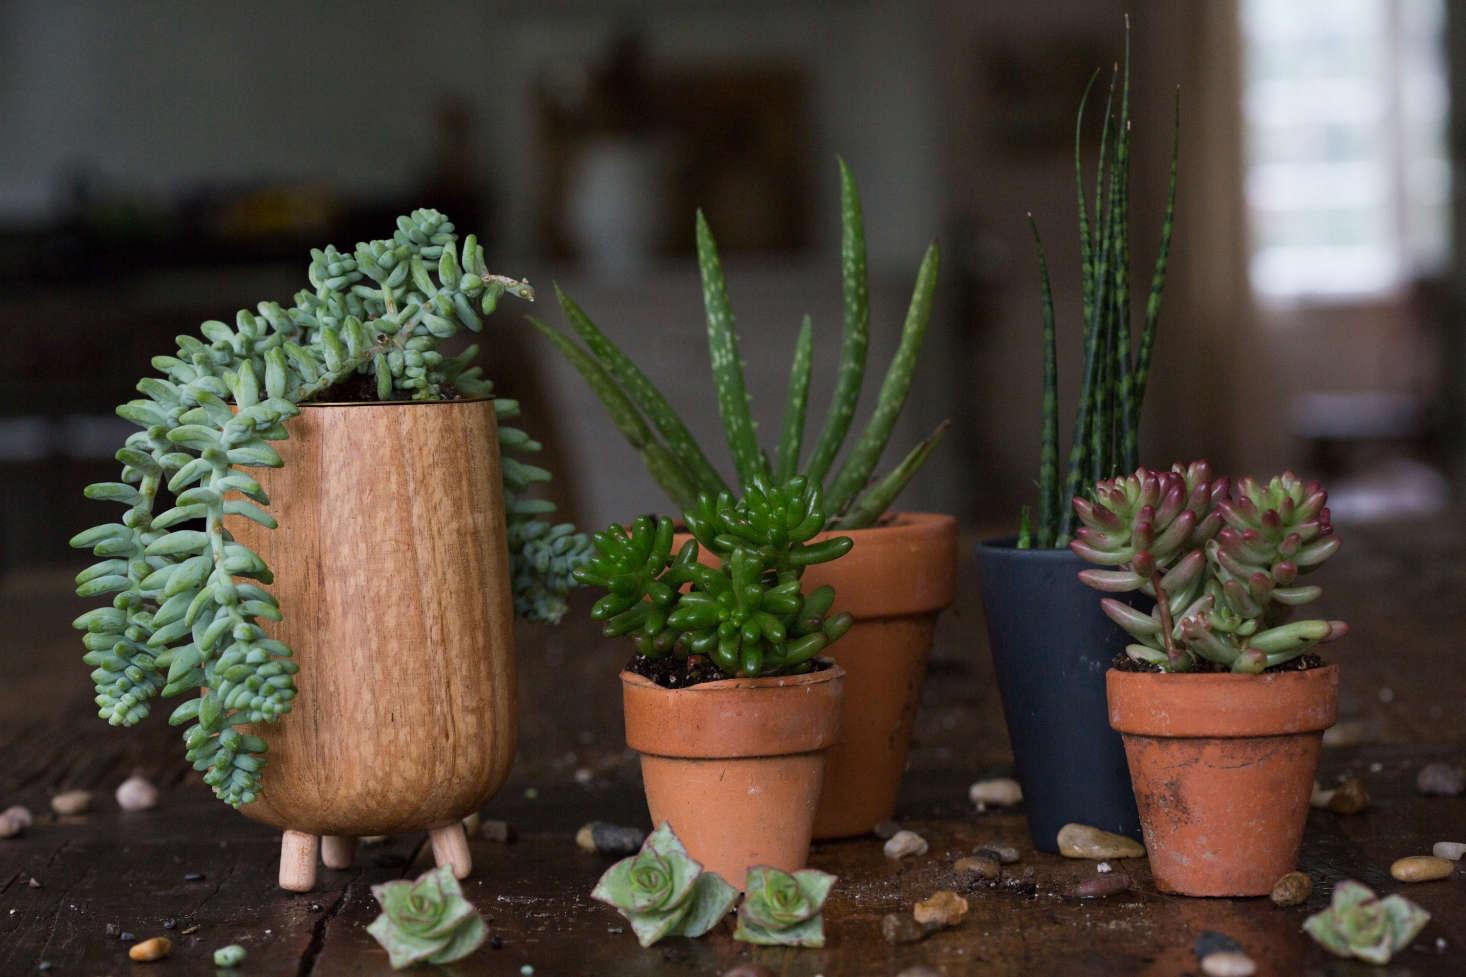 succulents 8 tips to help your favorite indoor plants survive winter gardenista. Black Bedroom Furniture Sets. Home Design Ideas